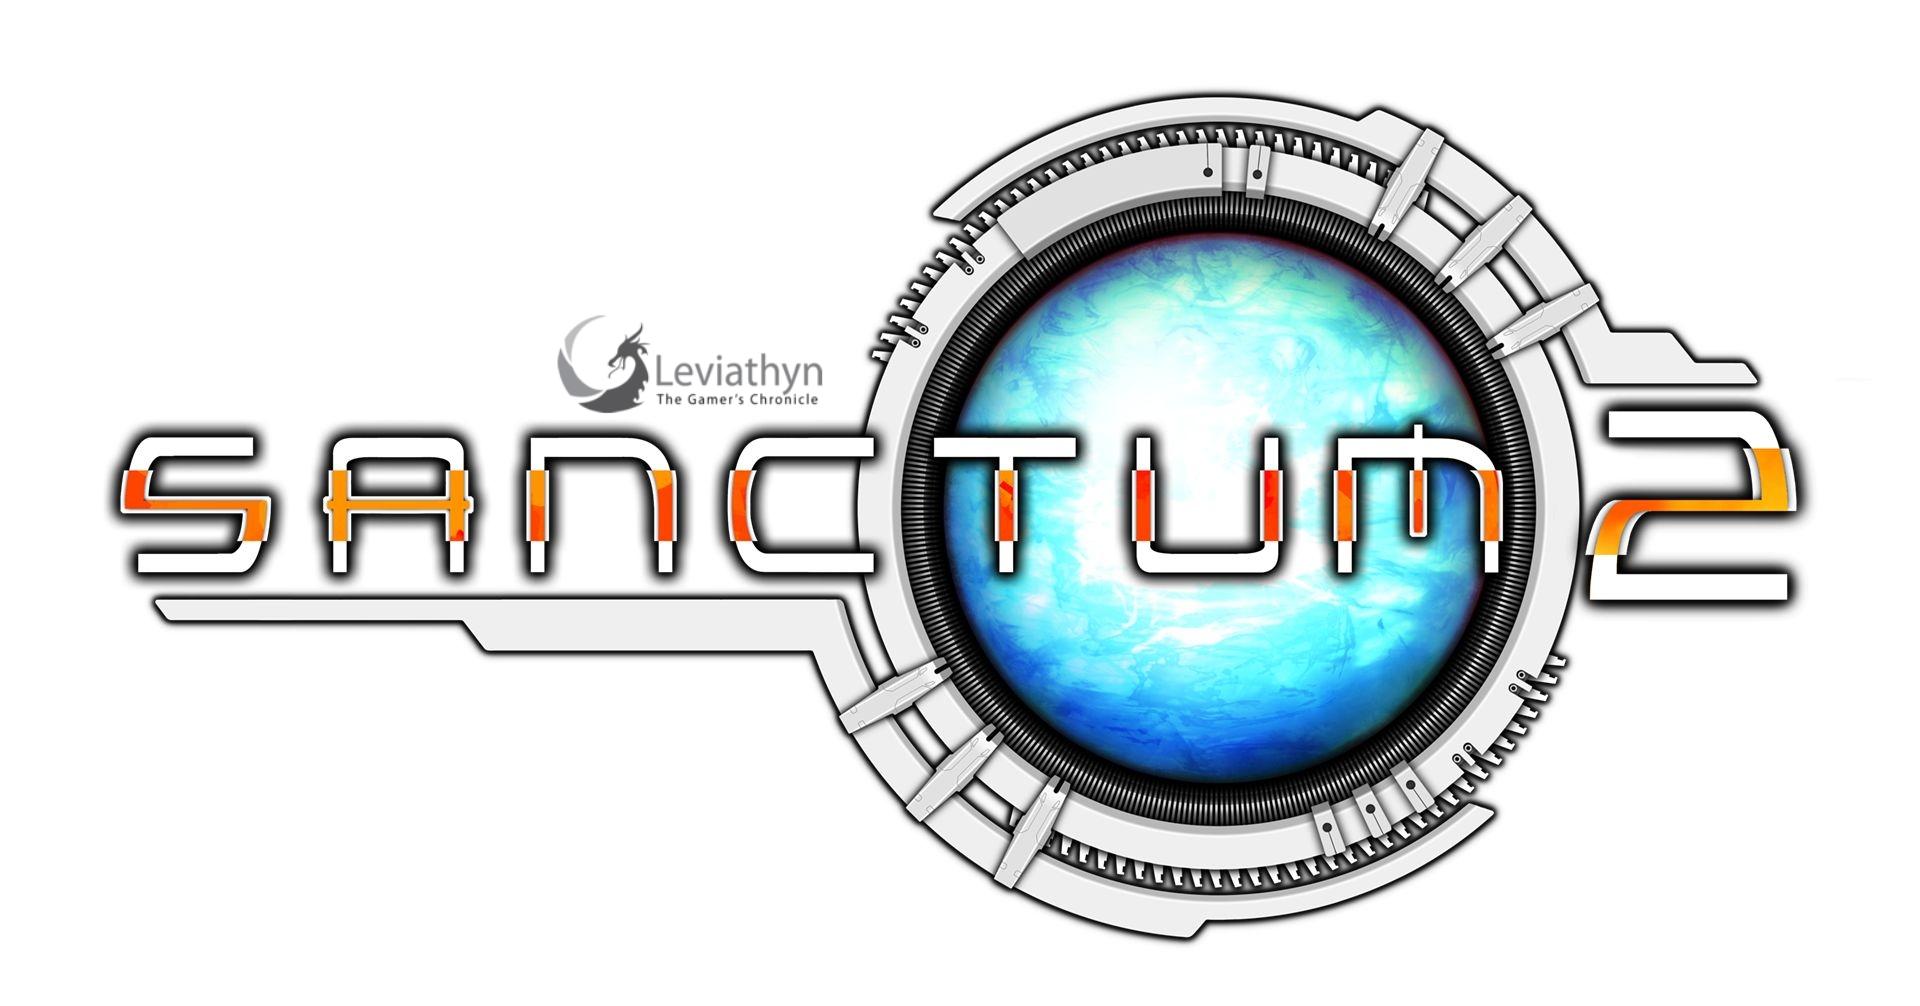 Sanctum 2 and Season Pass Steam Sale Giveaway!